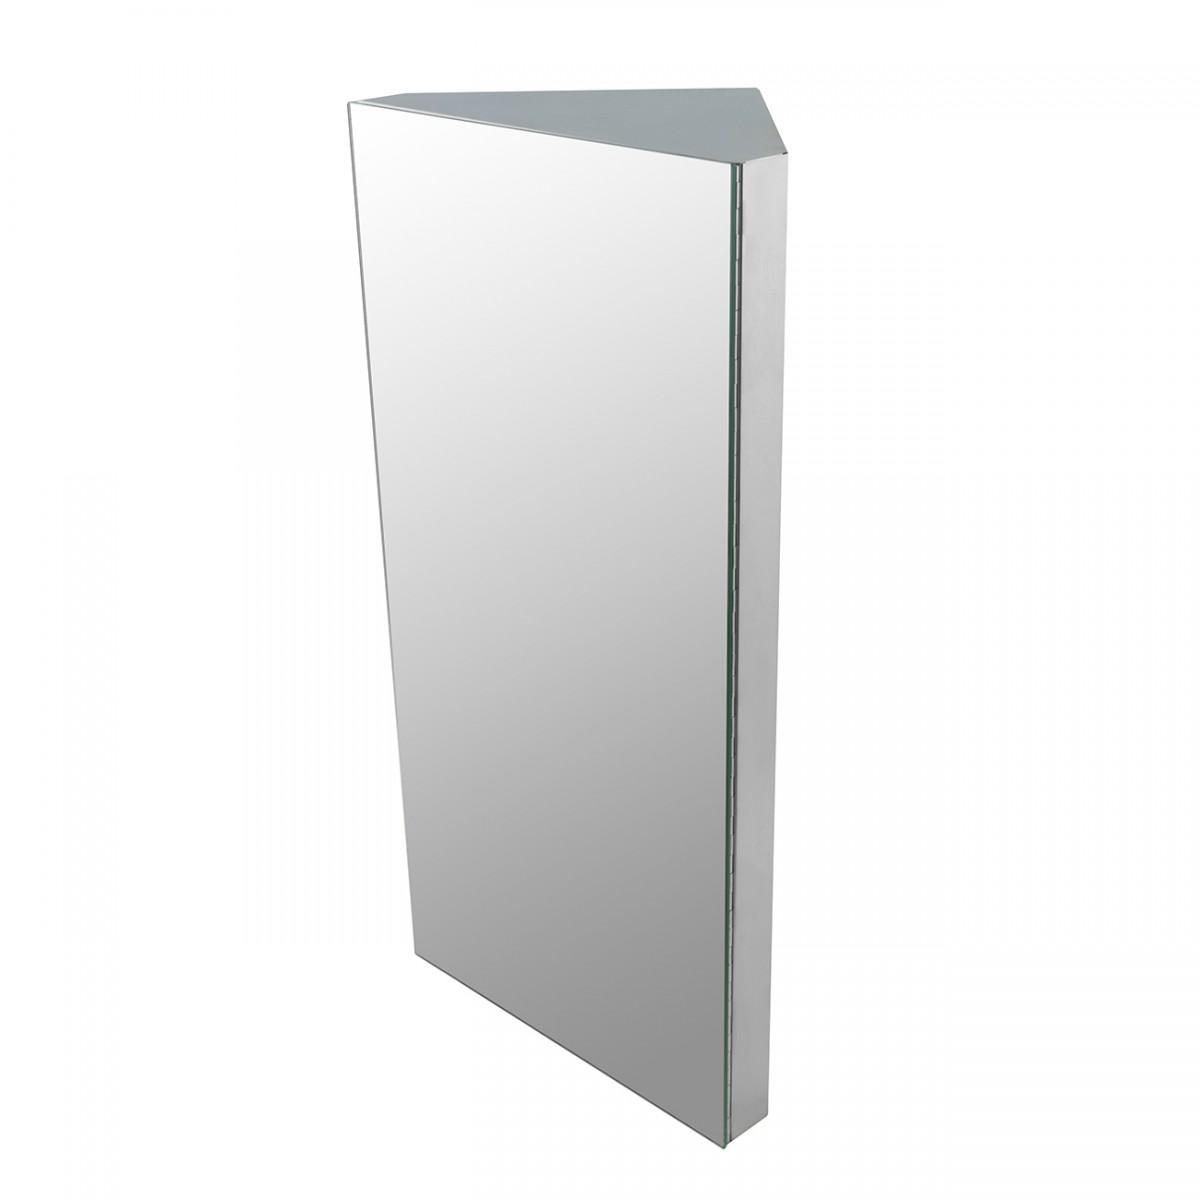 Stainless Steel Medicine Cabinet Corner Wall Mount